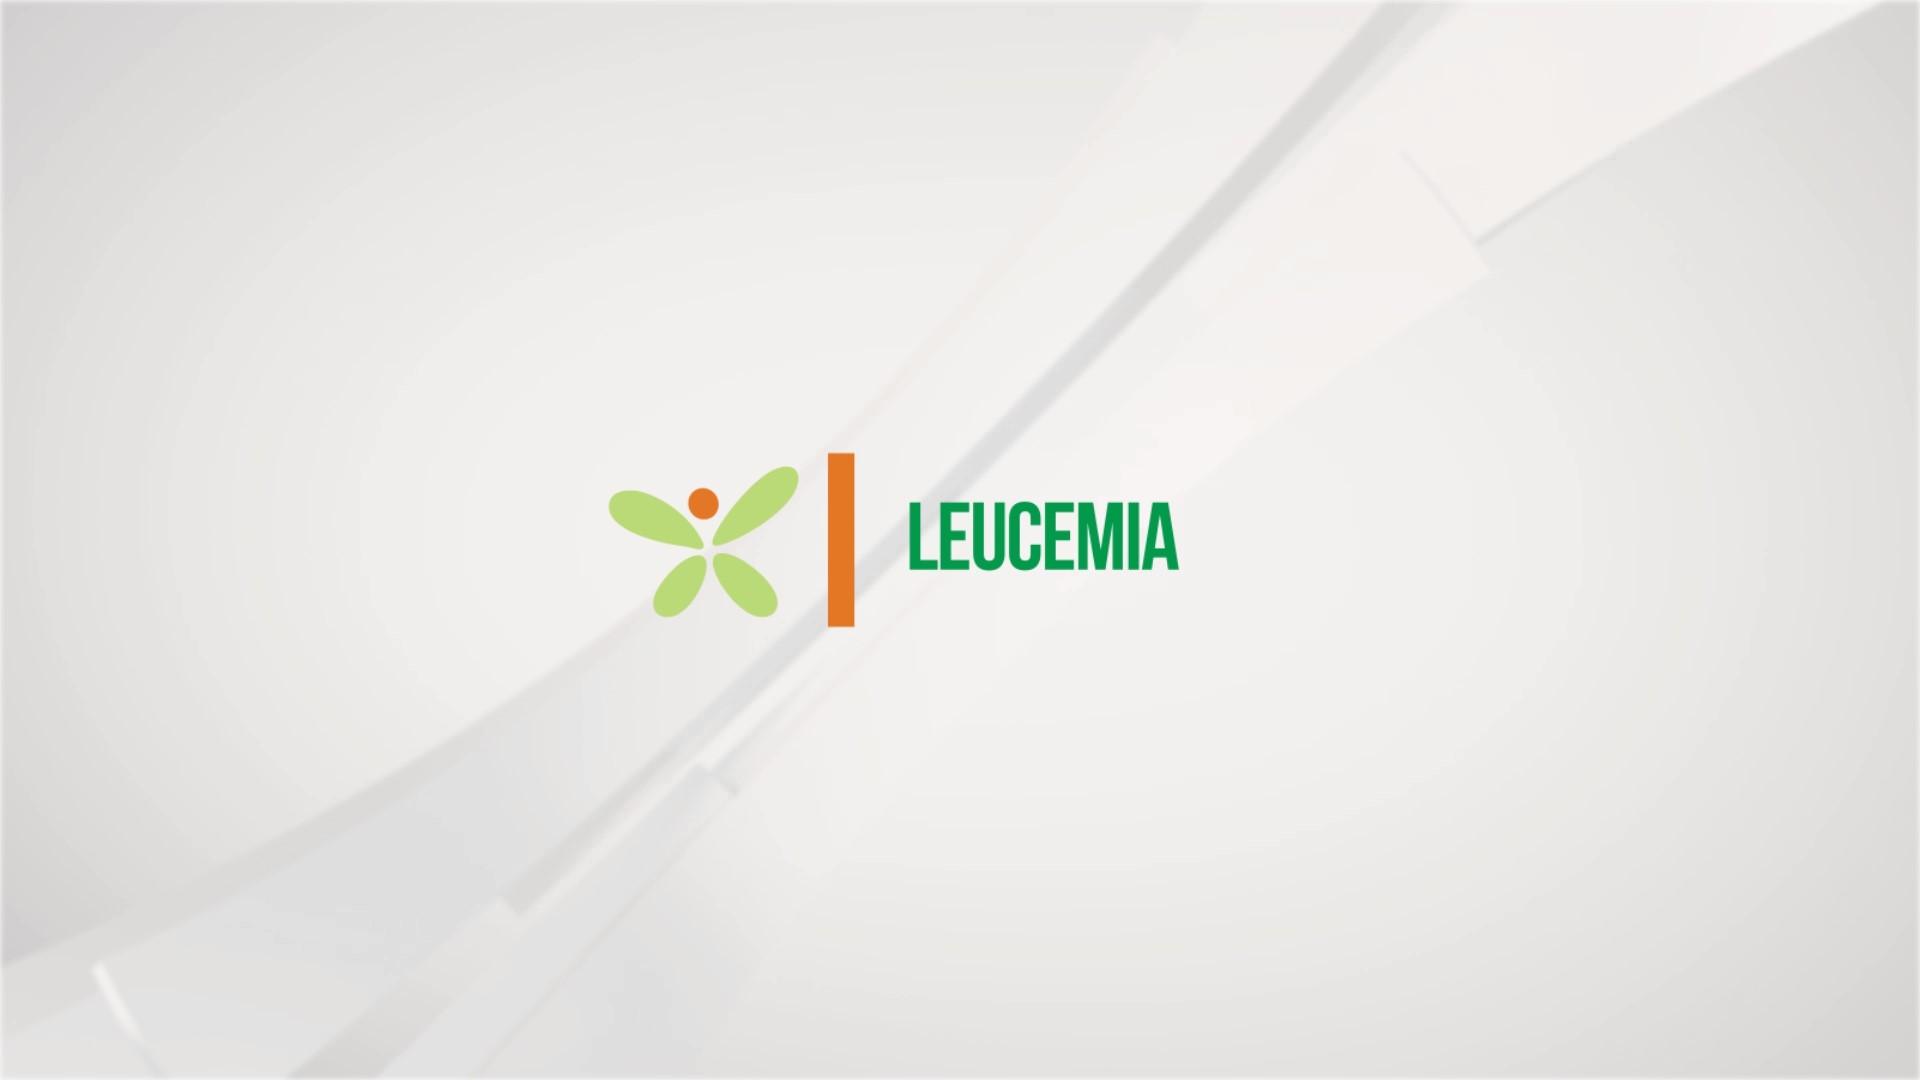 Leucemia – Dr. Mateus Dalló Dal Pont